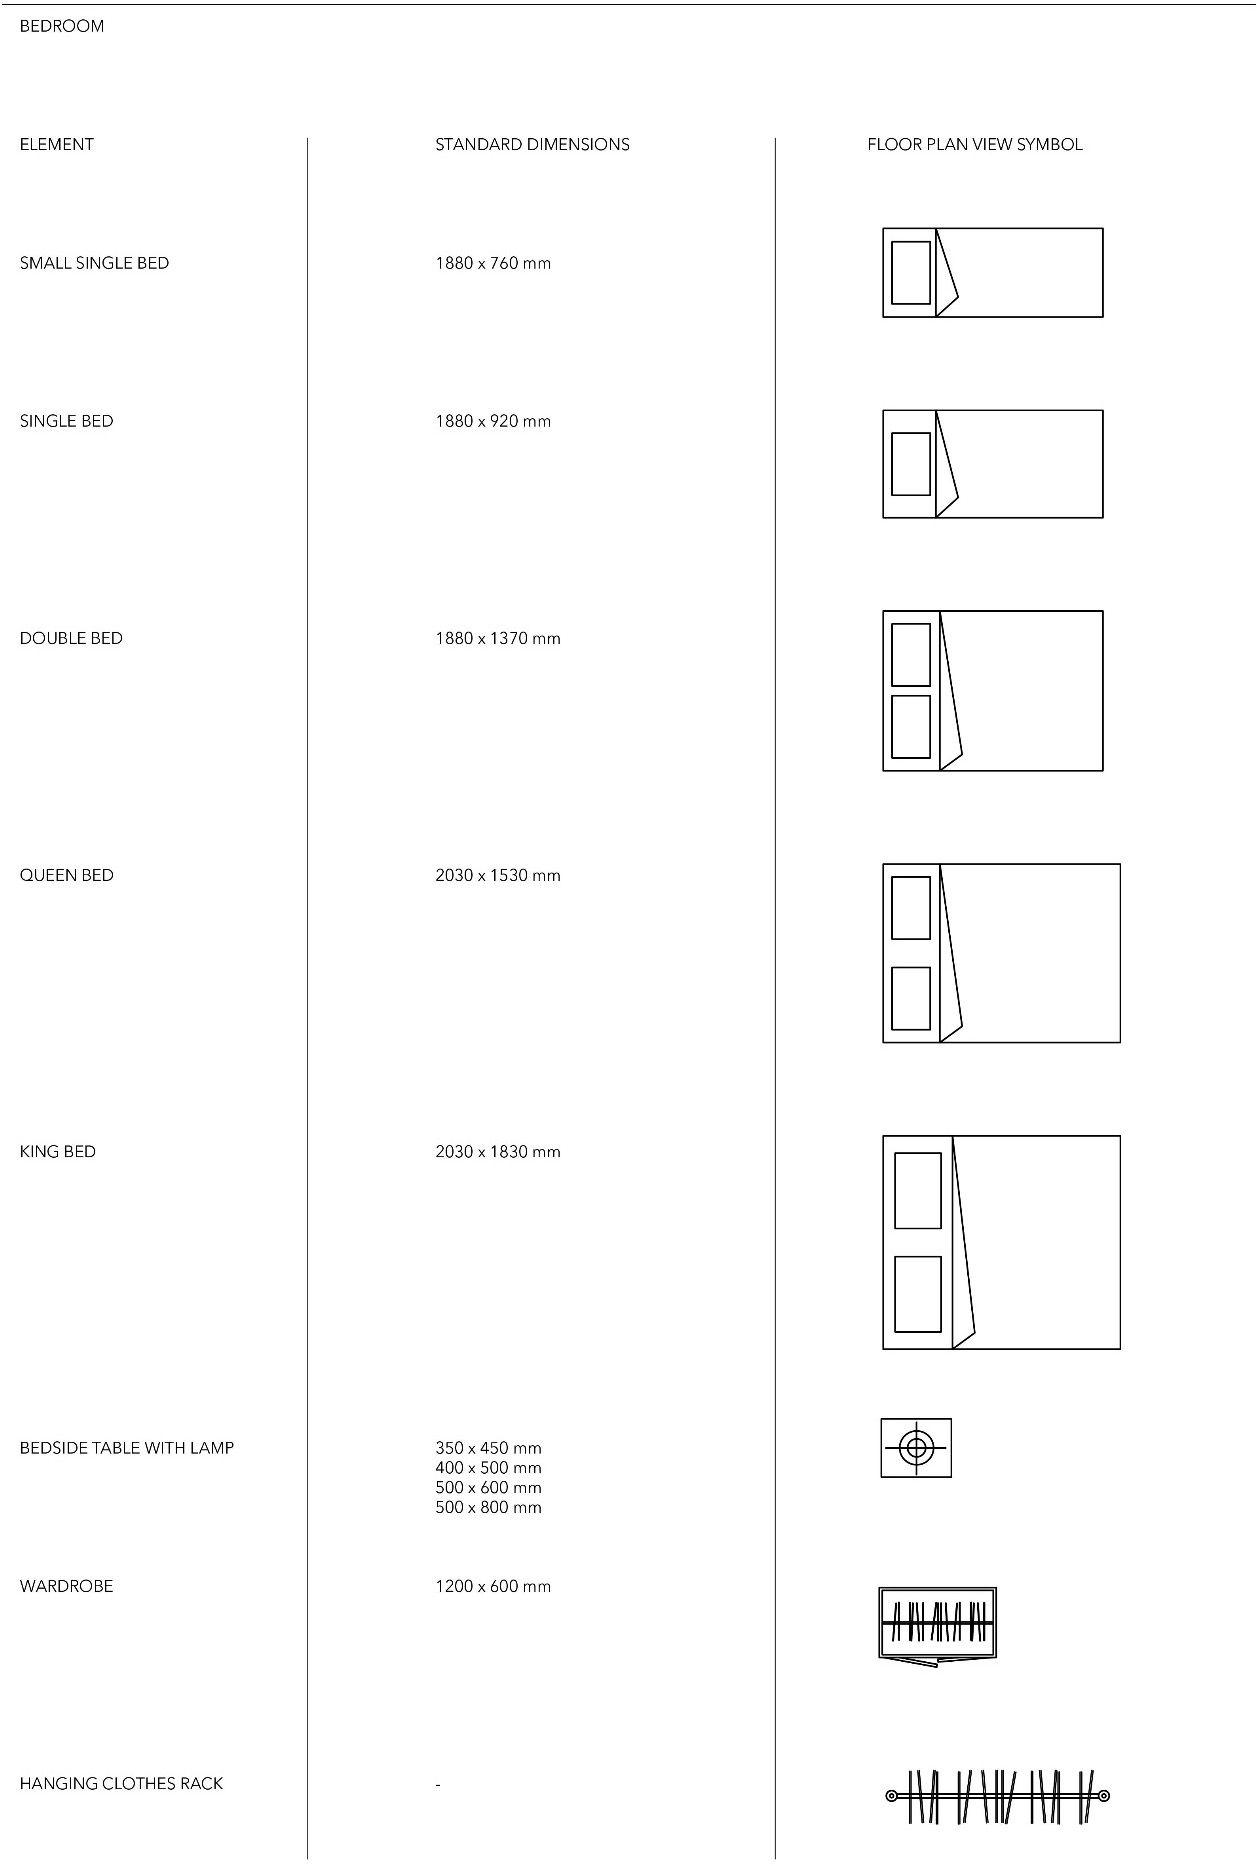 Floor Plan View Furniture Symbols